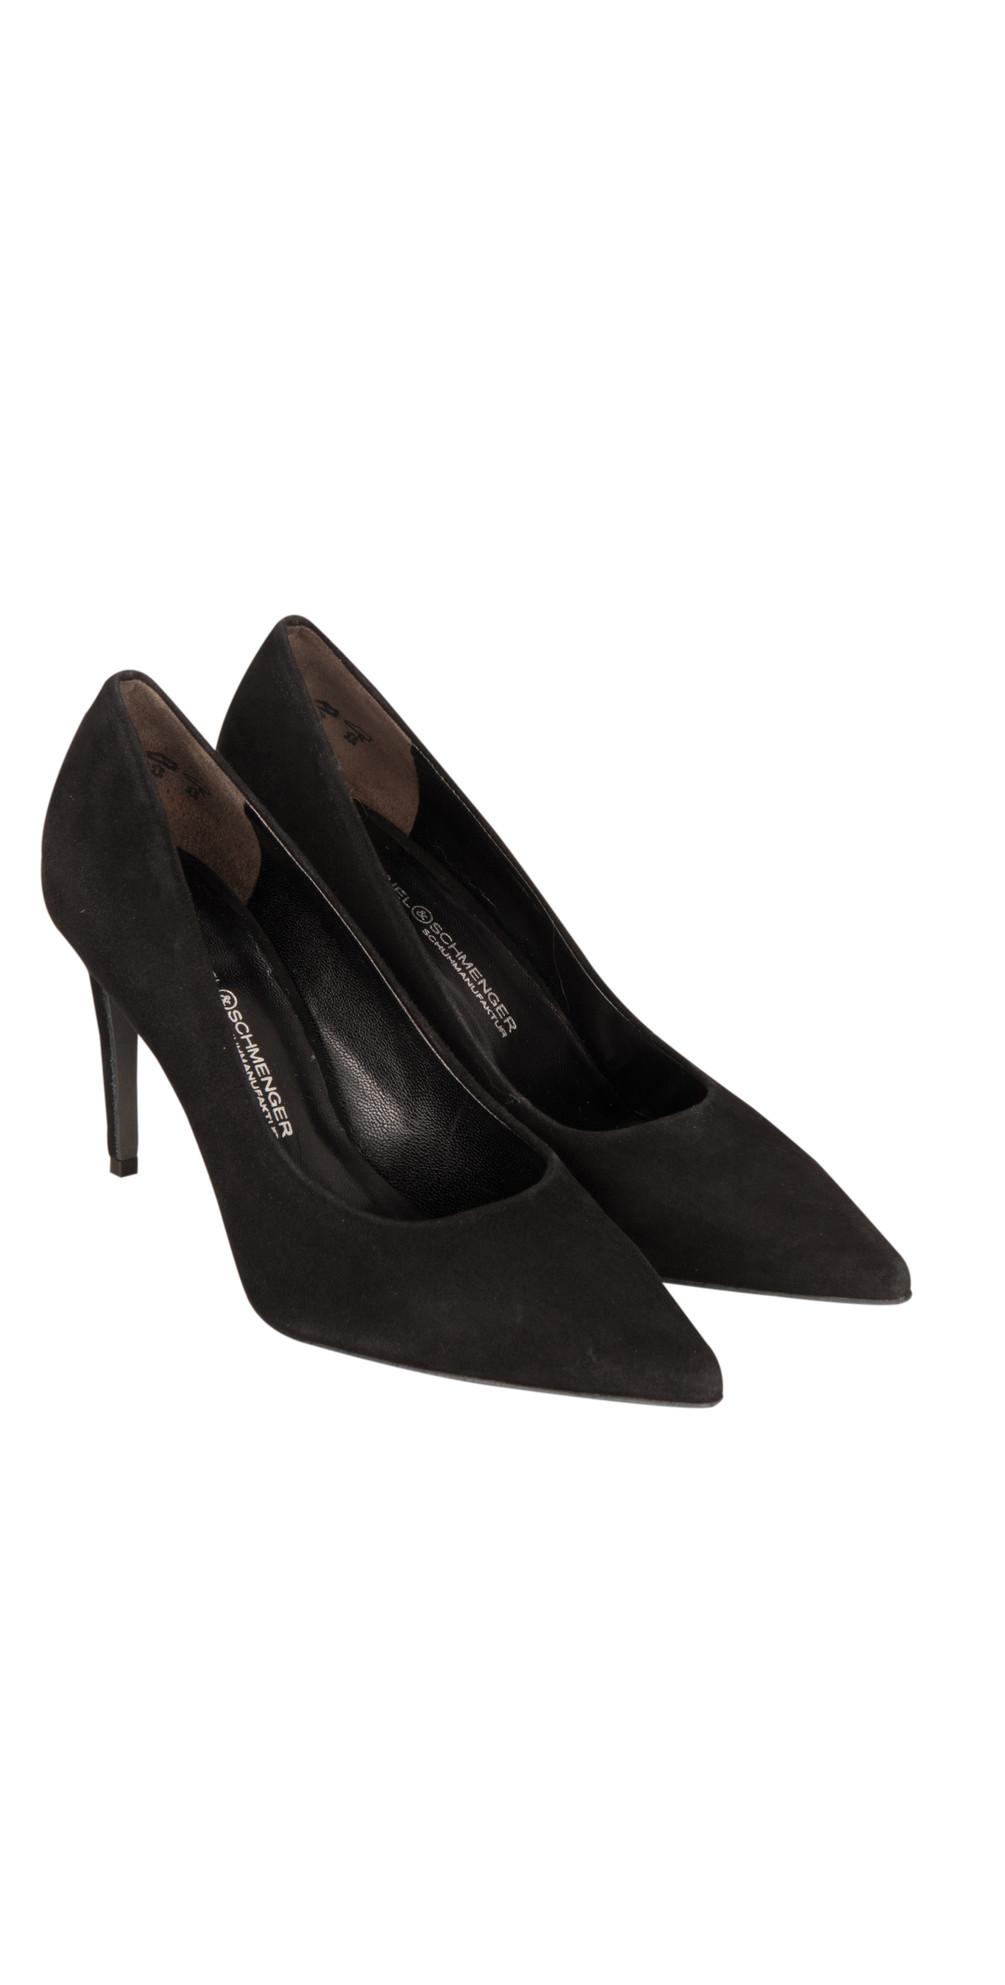 Miley Samtziege Shoe main image